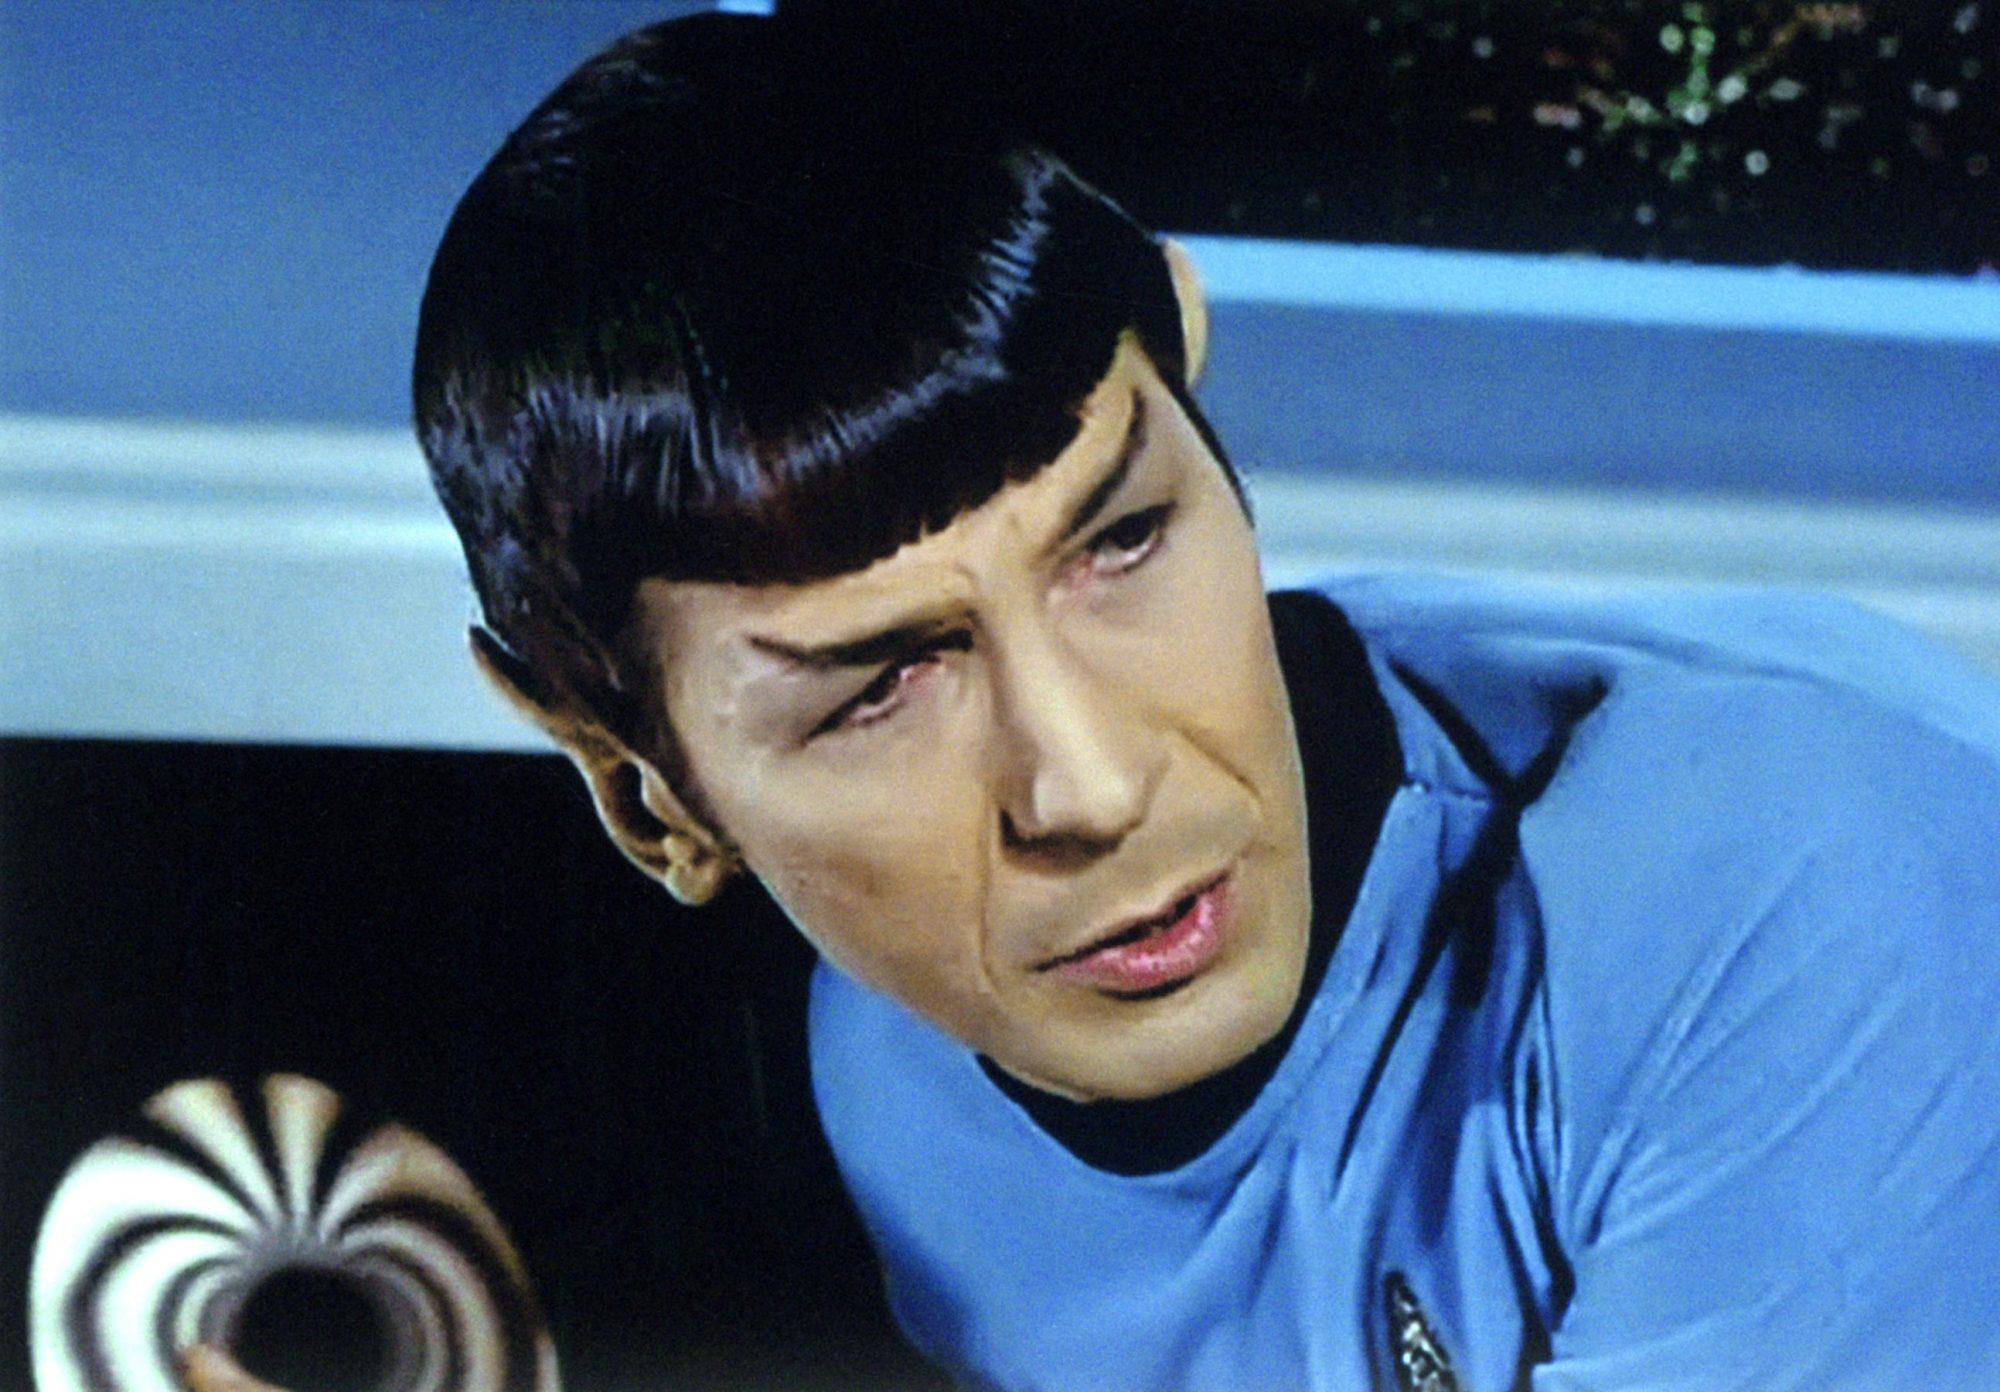 STAR TREK, Leonard Nimoy, 1966-69.